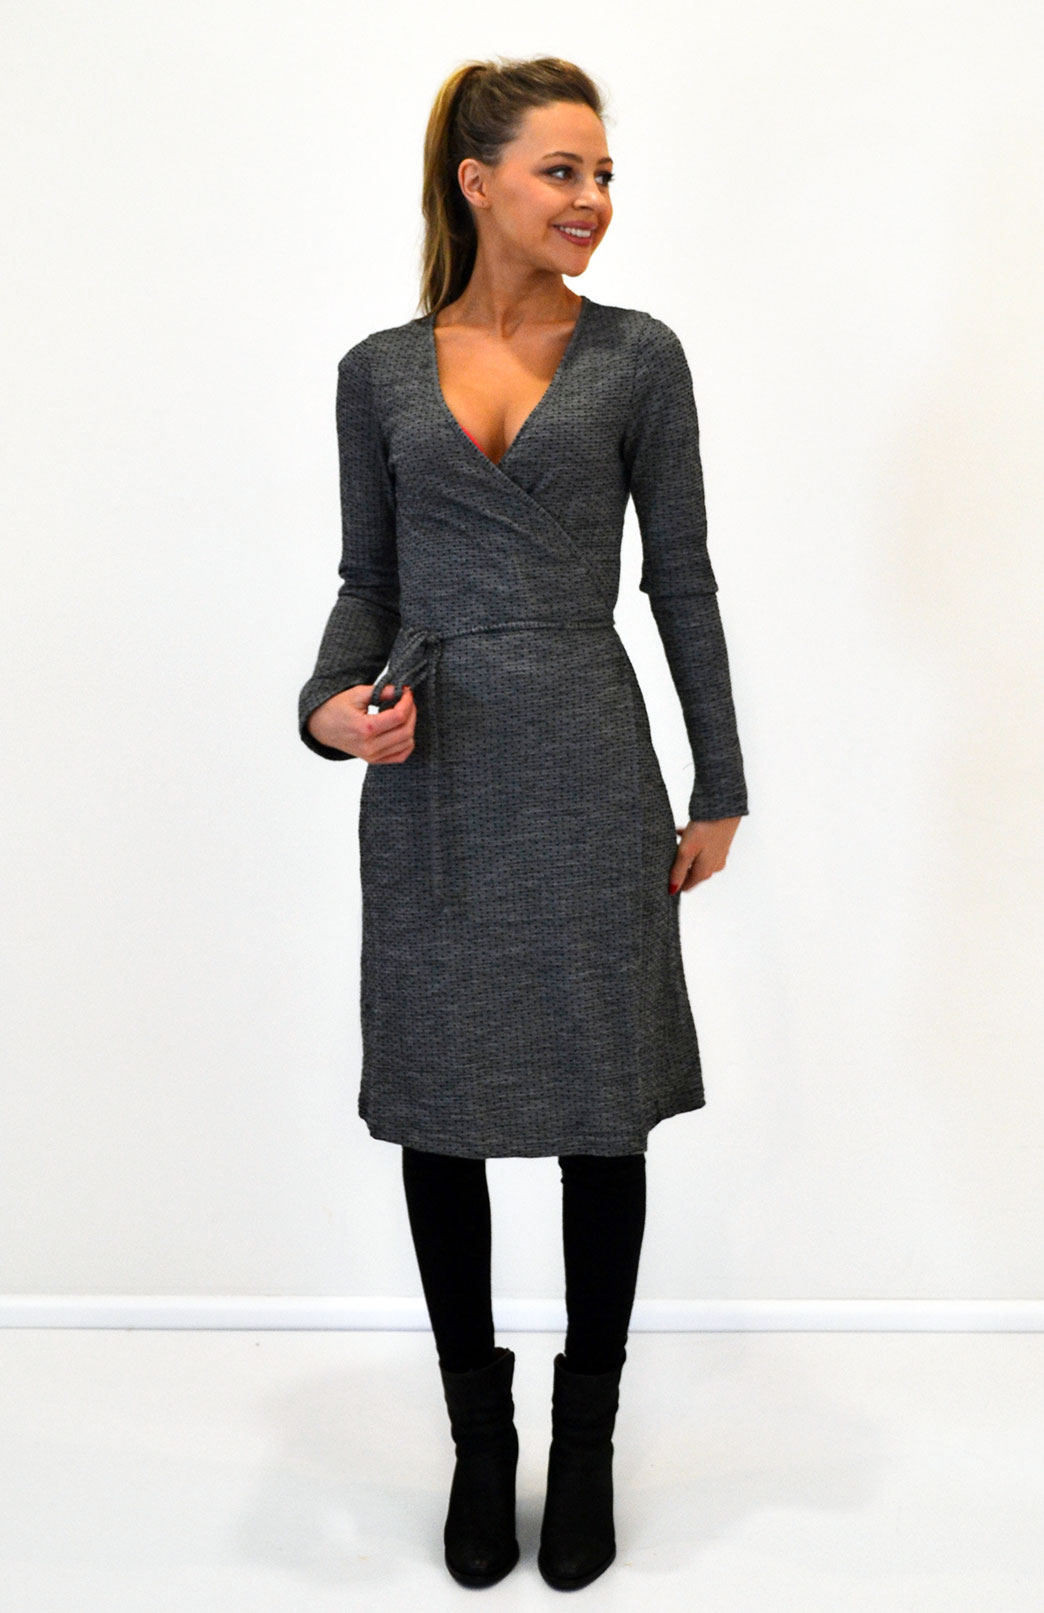 Long Sleeve Wrap Dress - Women's Black Spot Merino Wool Long Sleeve Wrap Party Dress - Smitten Merino Tasmania Australia